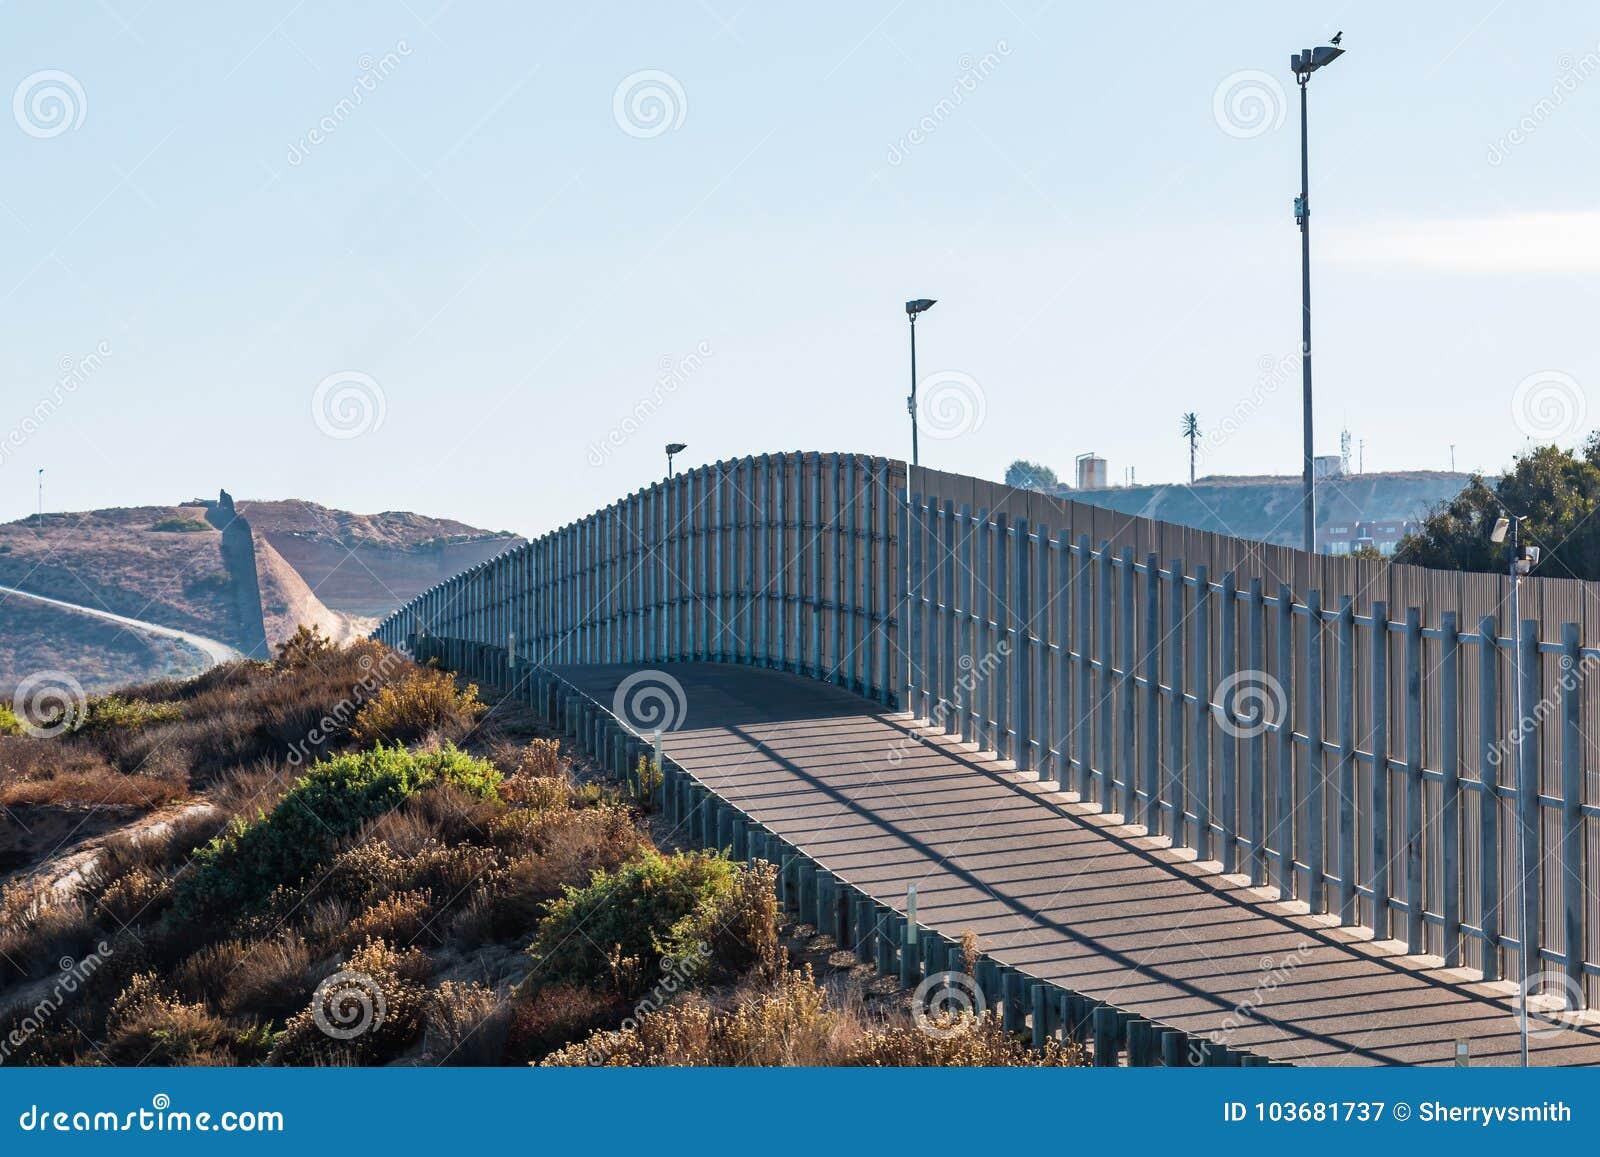 Section of International Border Wall Between San Diego/Tijuana